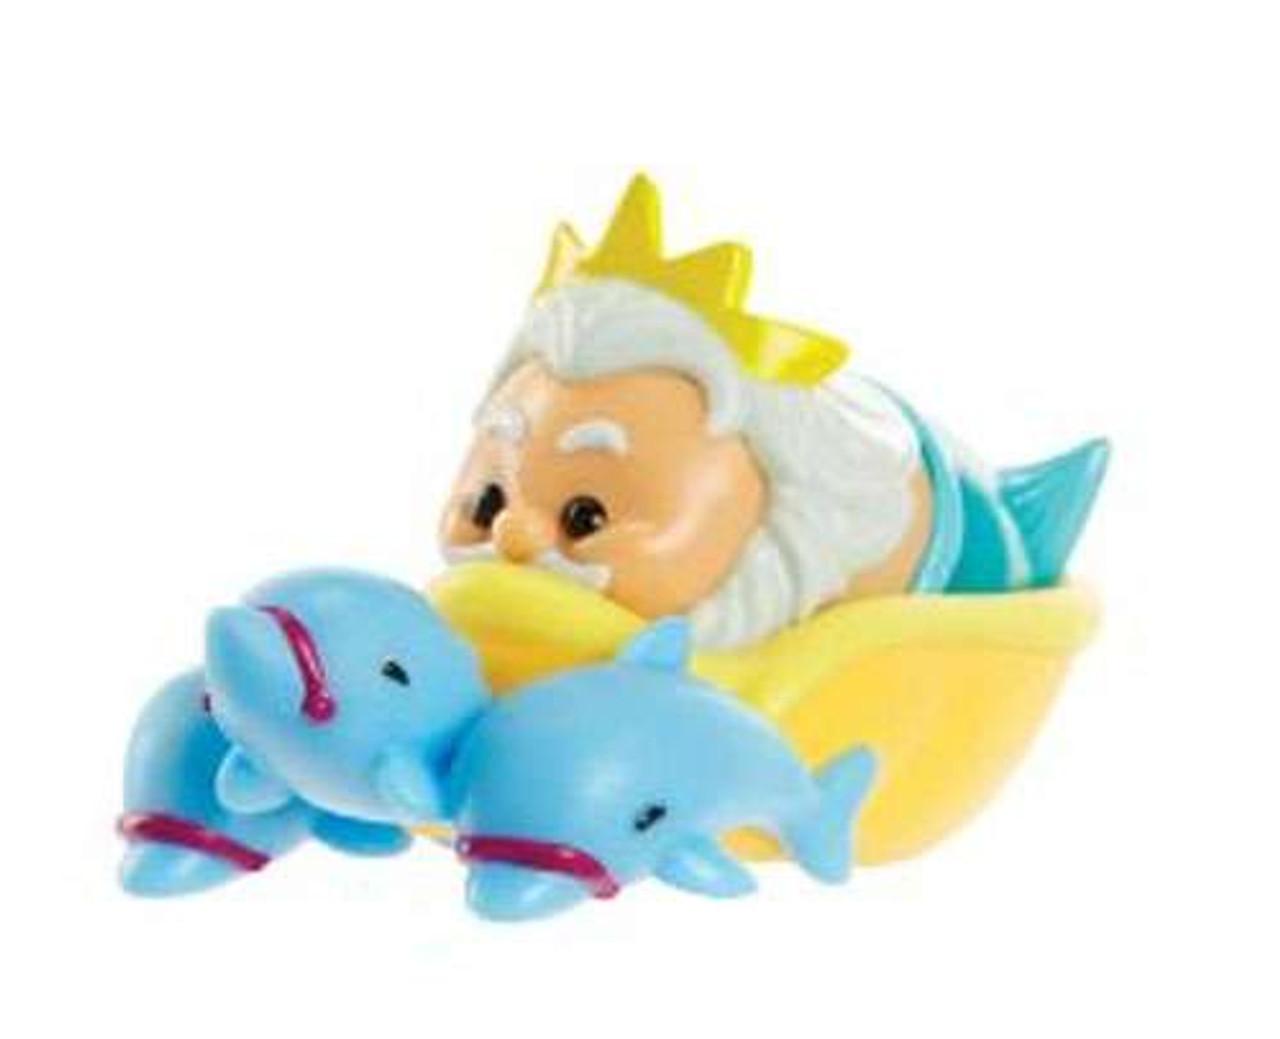 disney the little mermaid tsum tsum series 5 king triton mystery